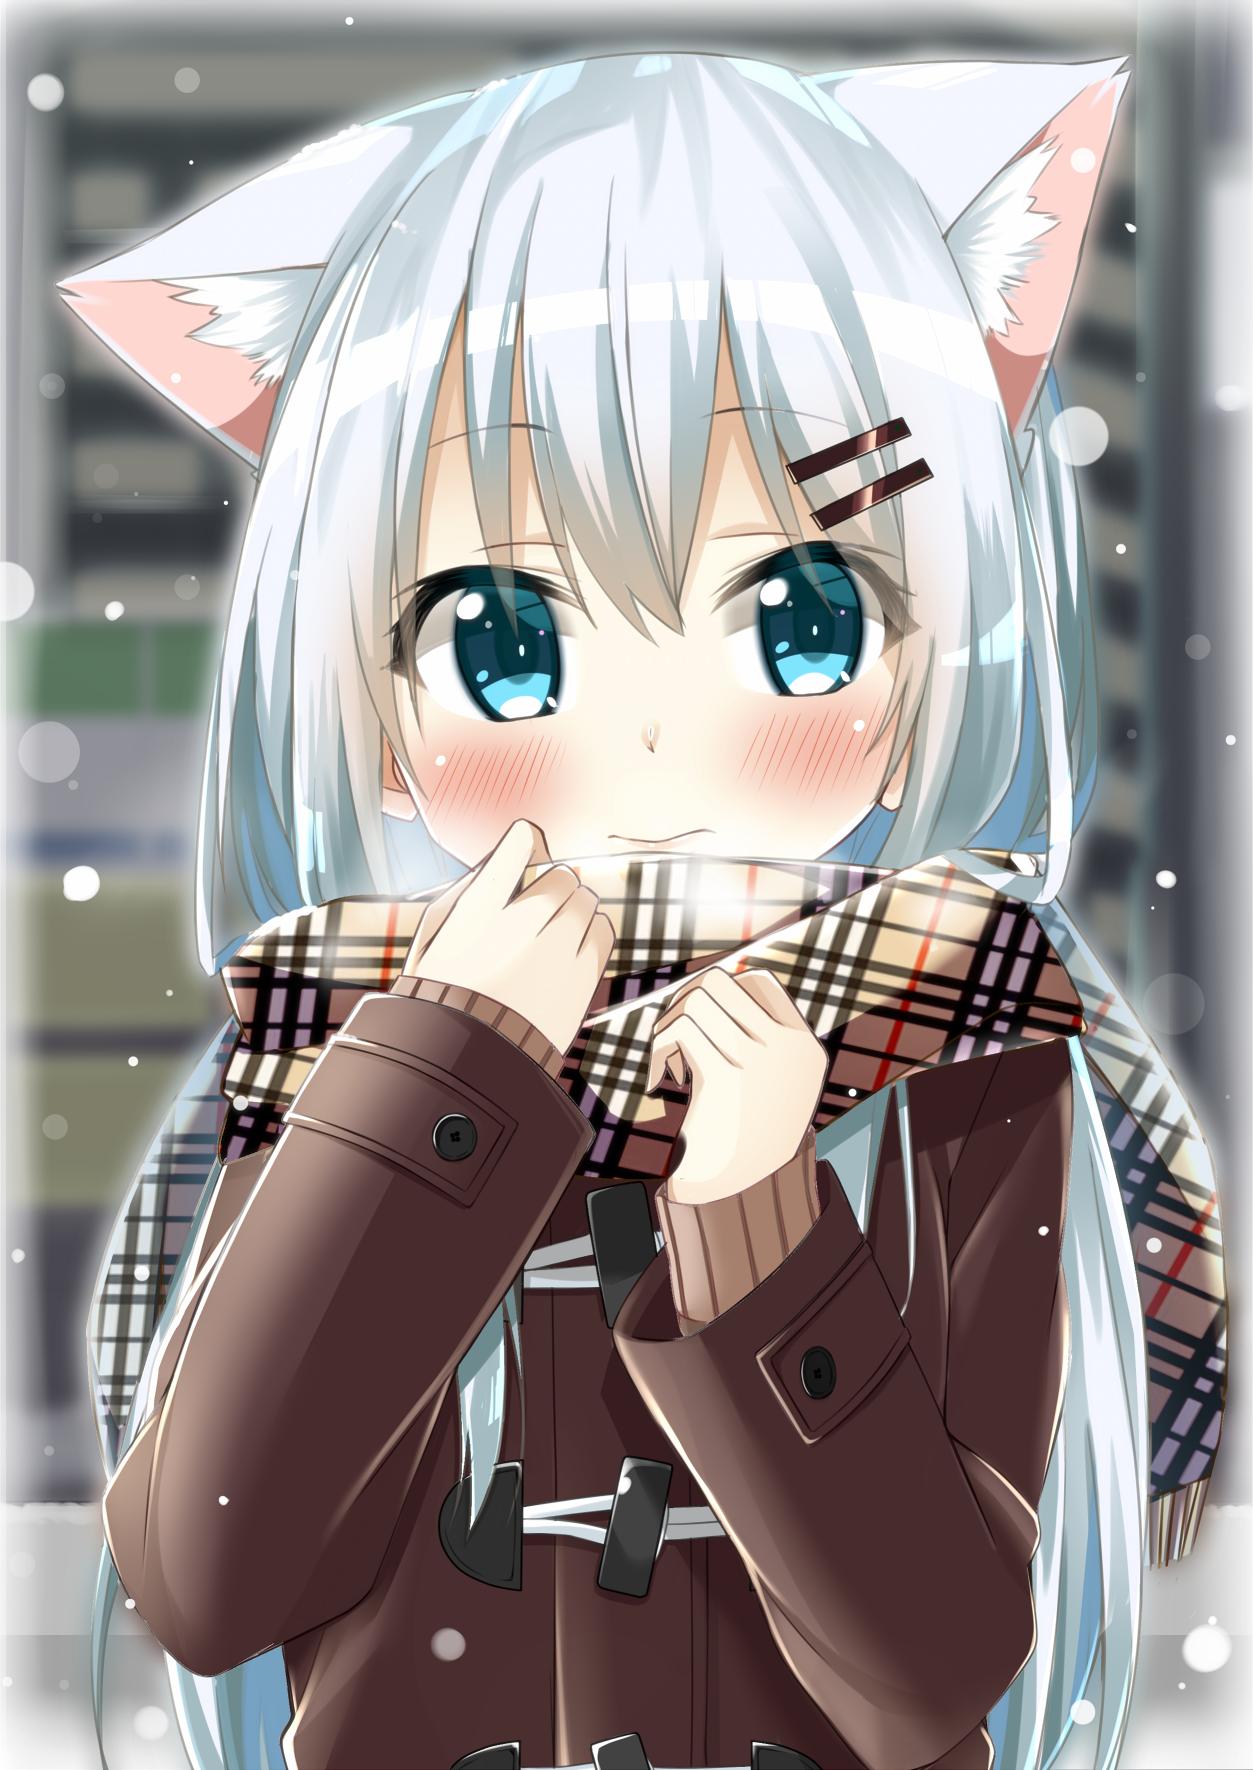 u57g.png (1253×1770) Menina anime, Neko, Anime